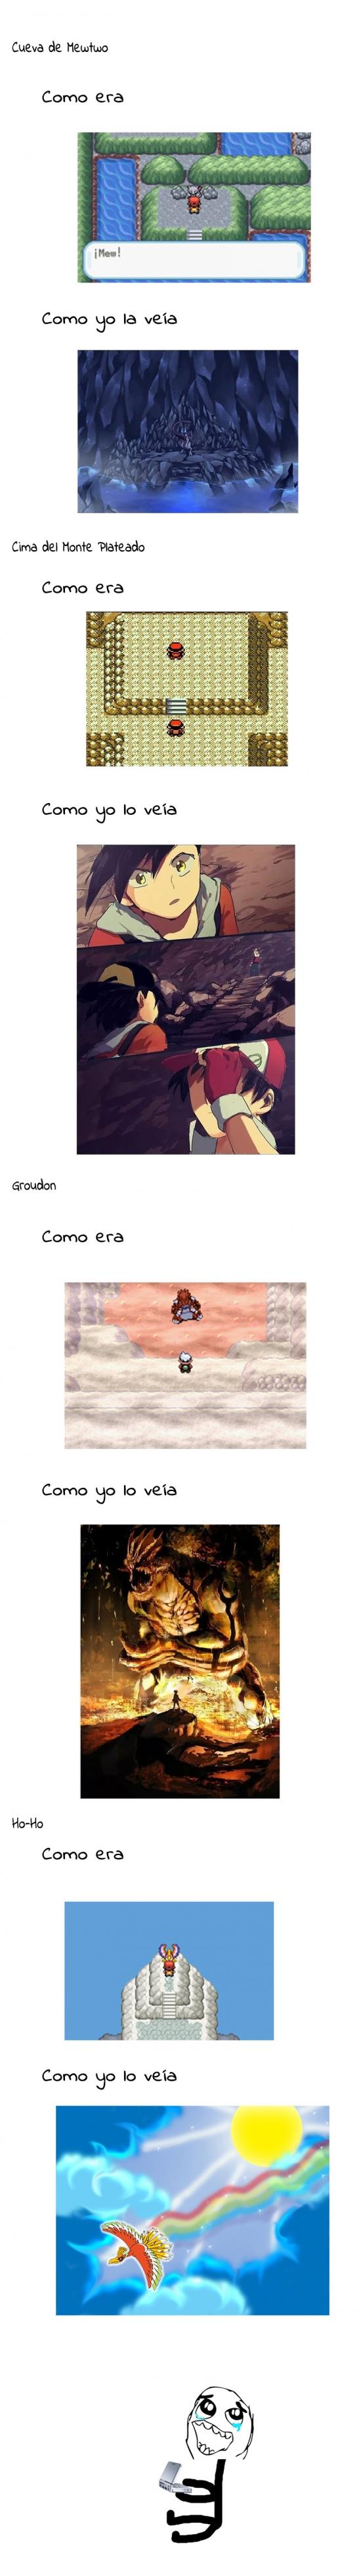 esmeralda,game boy,groudon,ho-ho,hoho,mewtwo,niño,pokemon,rojo fuego